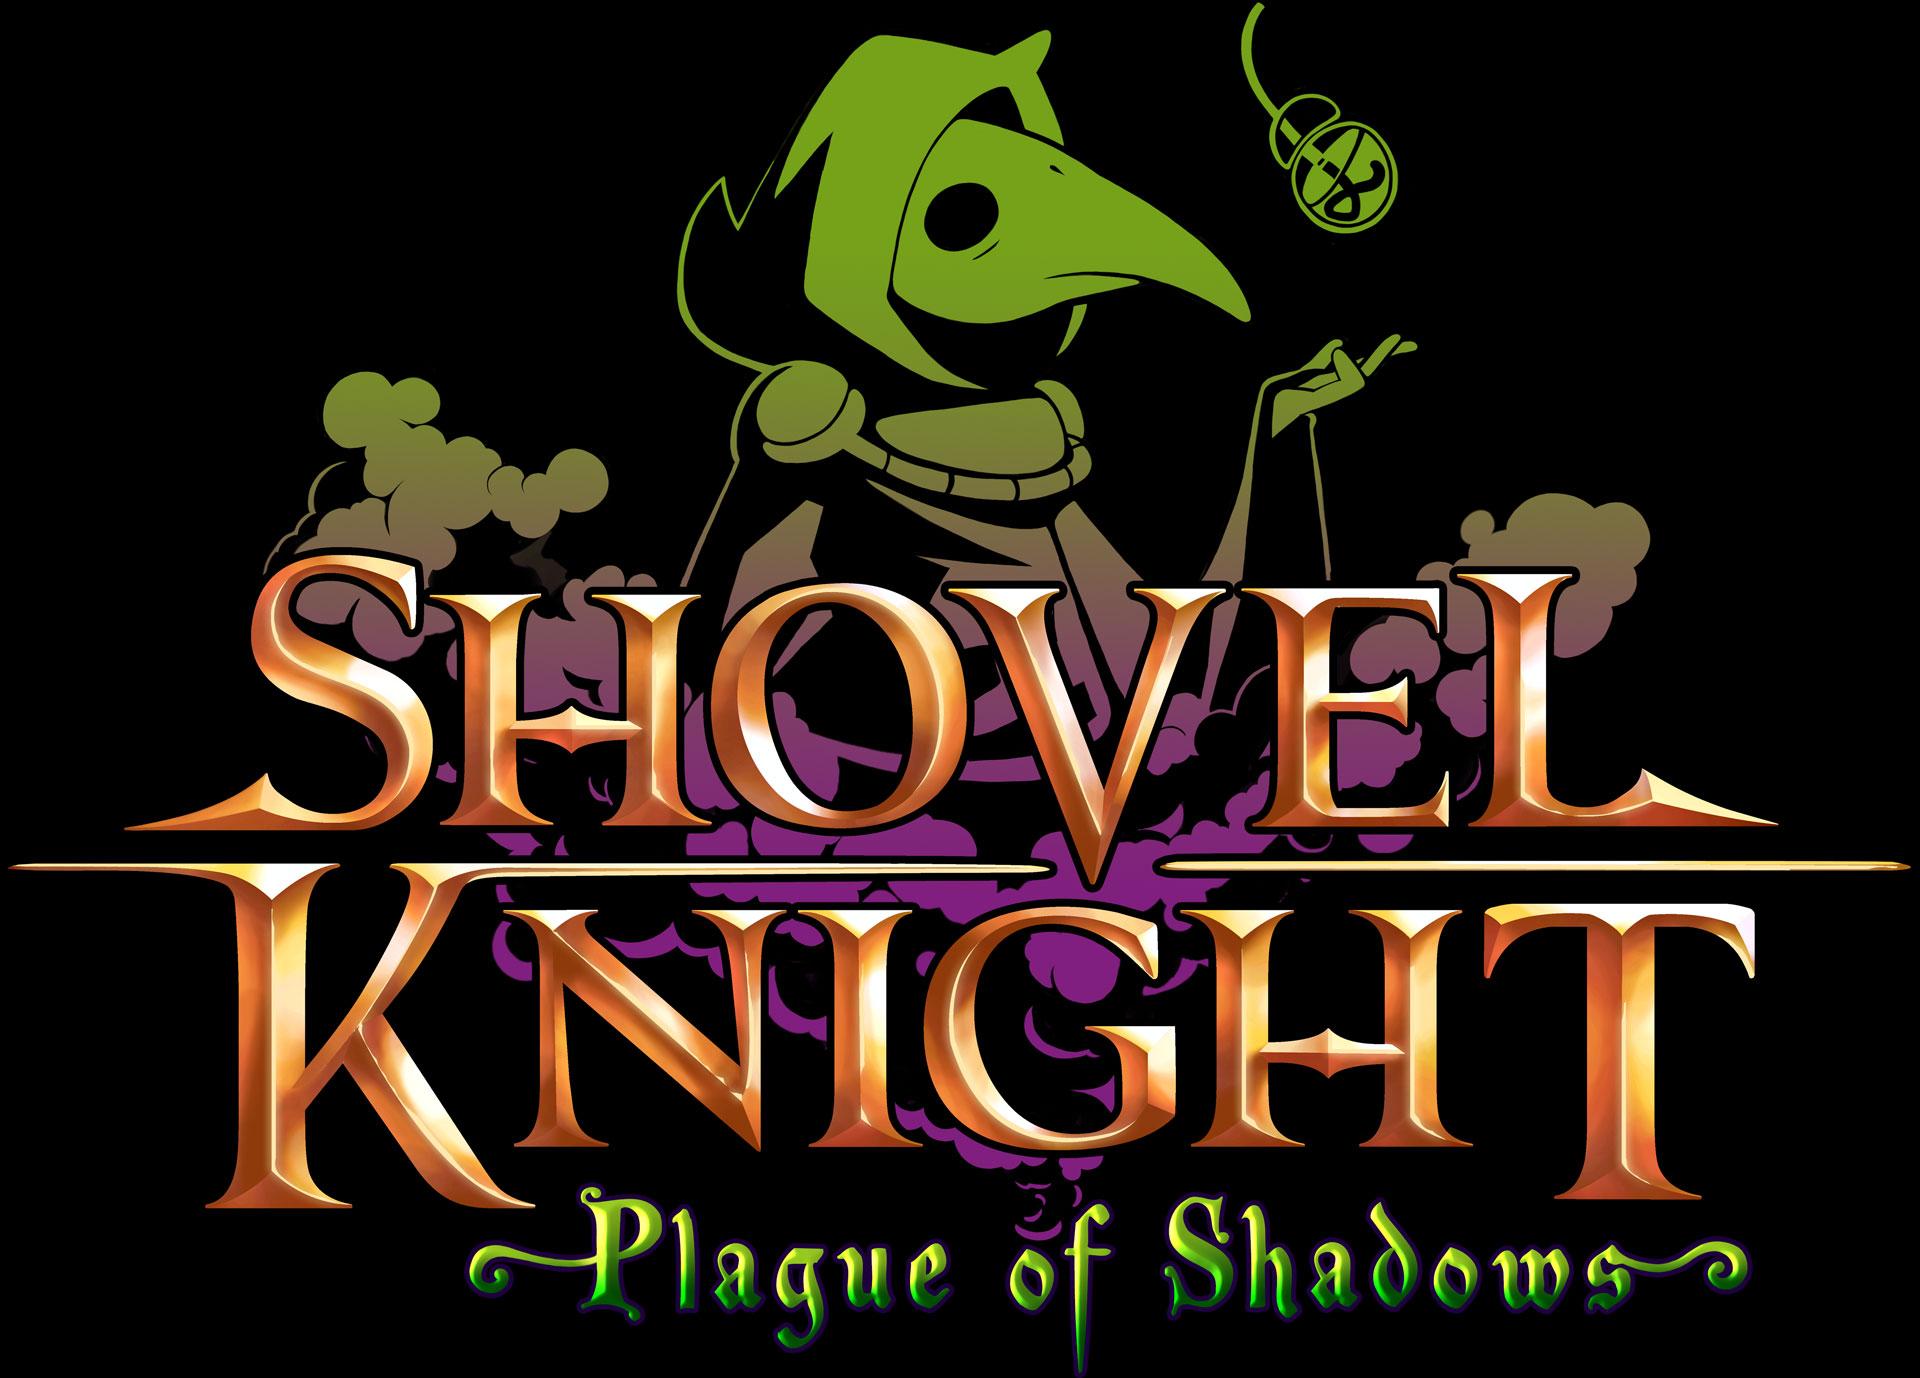 ShovelKnight-PlagueofShadows PC Jaquette 001